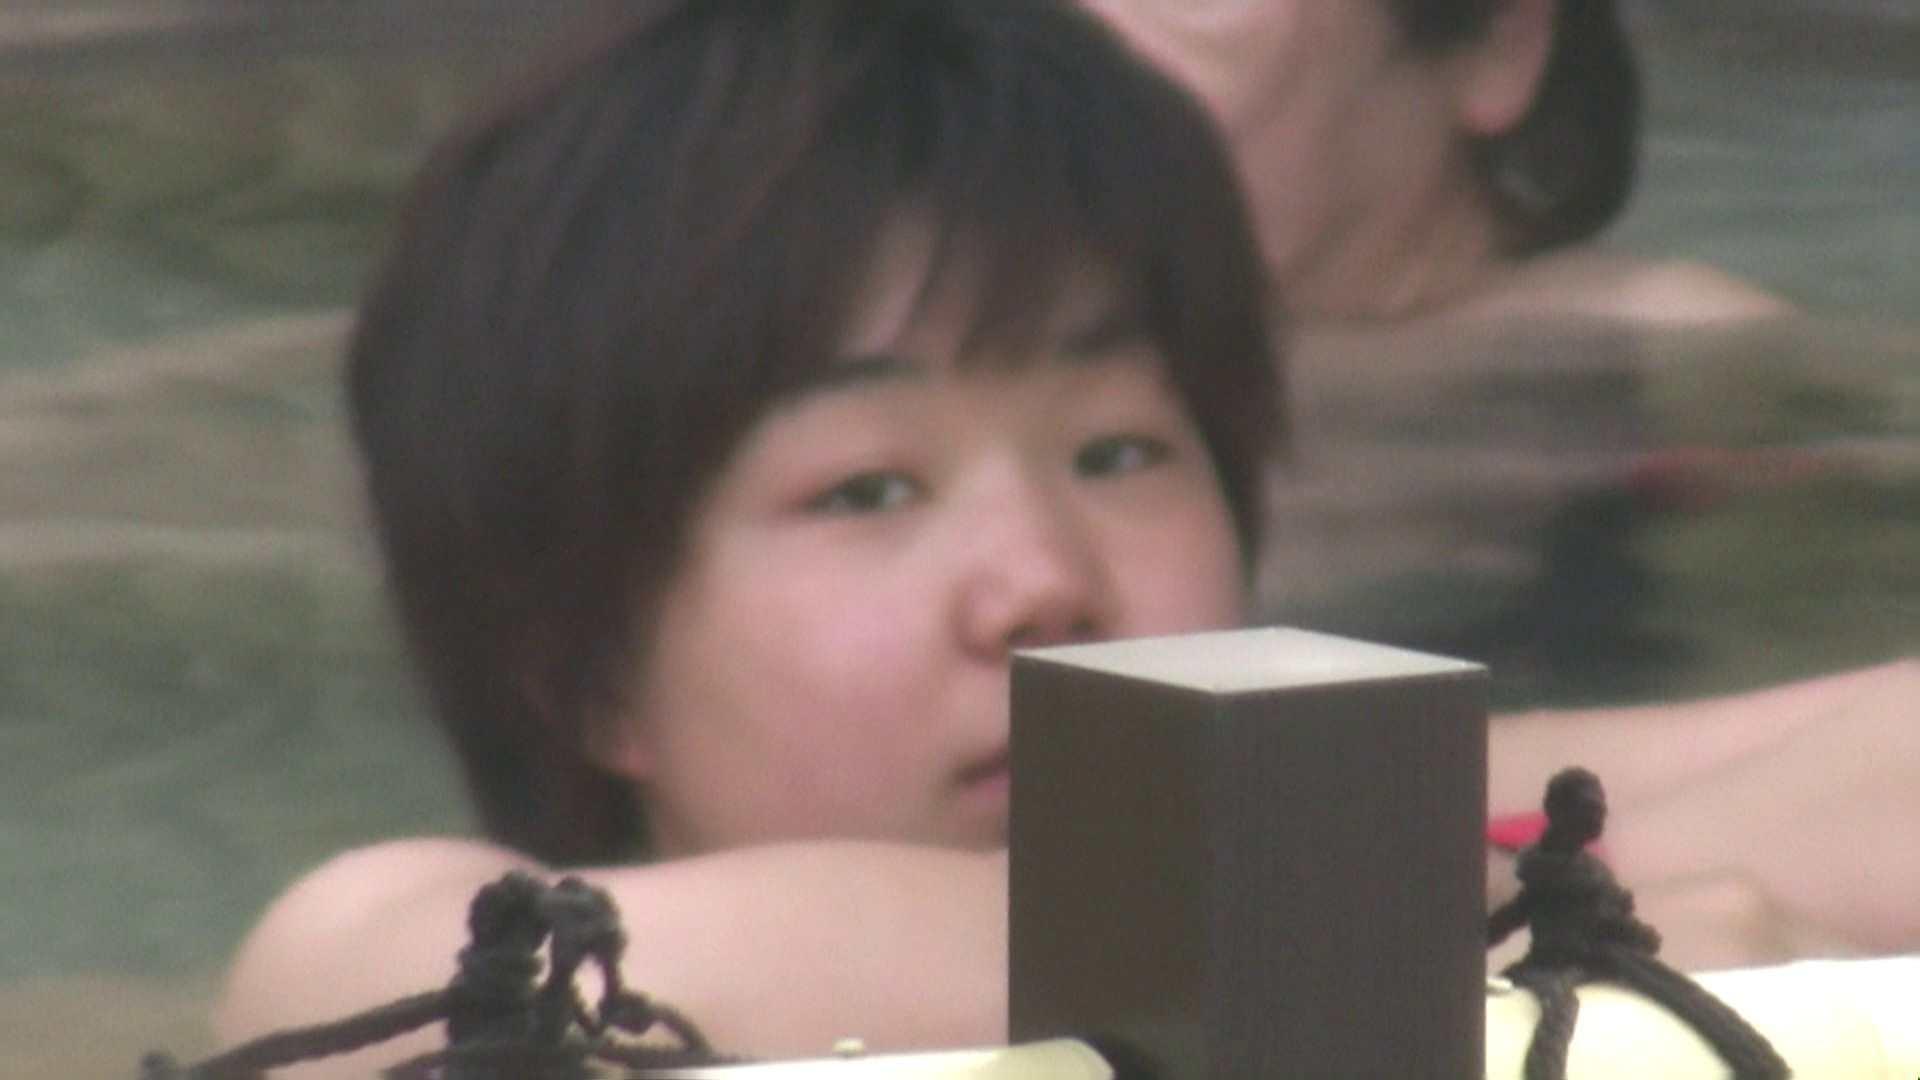 Aquaな露天風呂Vol.53【VIP限定】 盗撮師作品 おまんこ動画流出 78pic 26